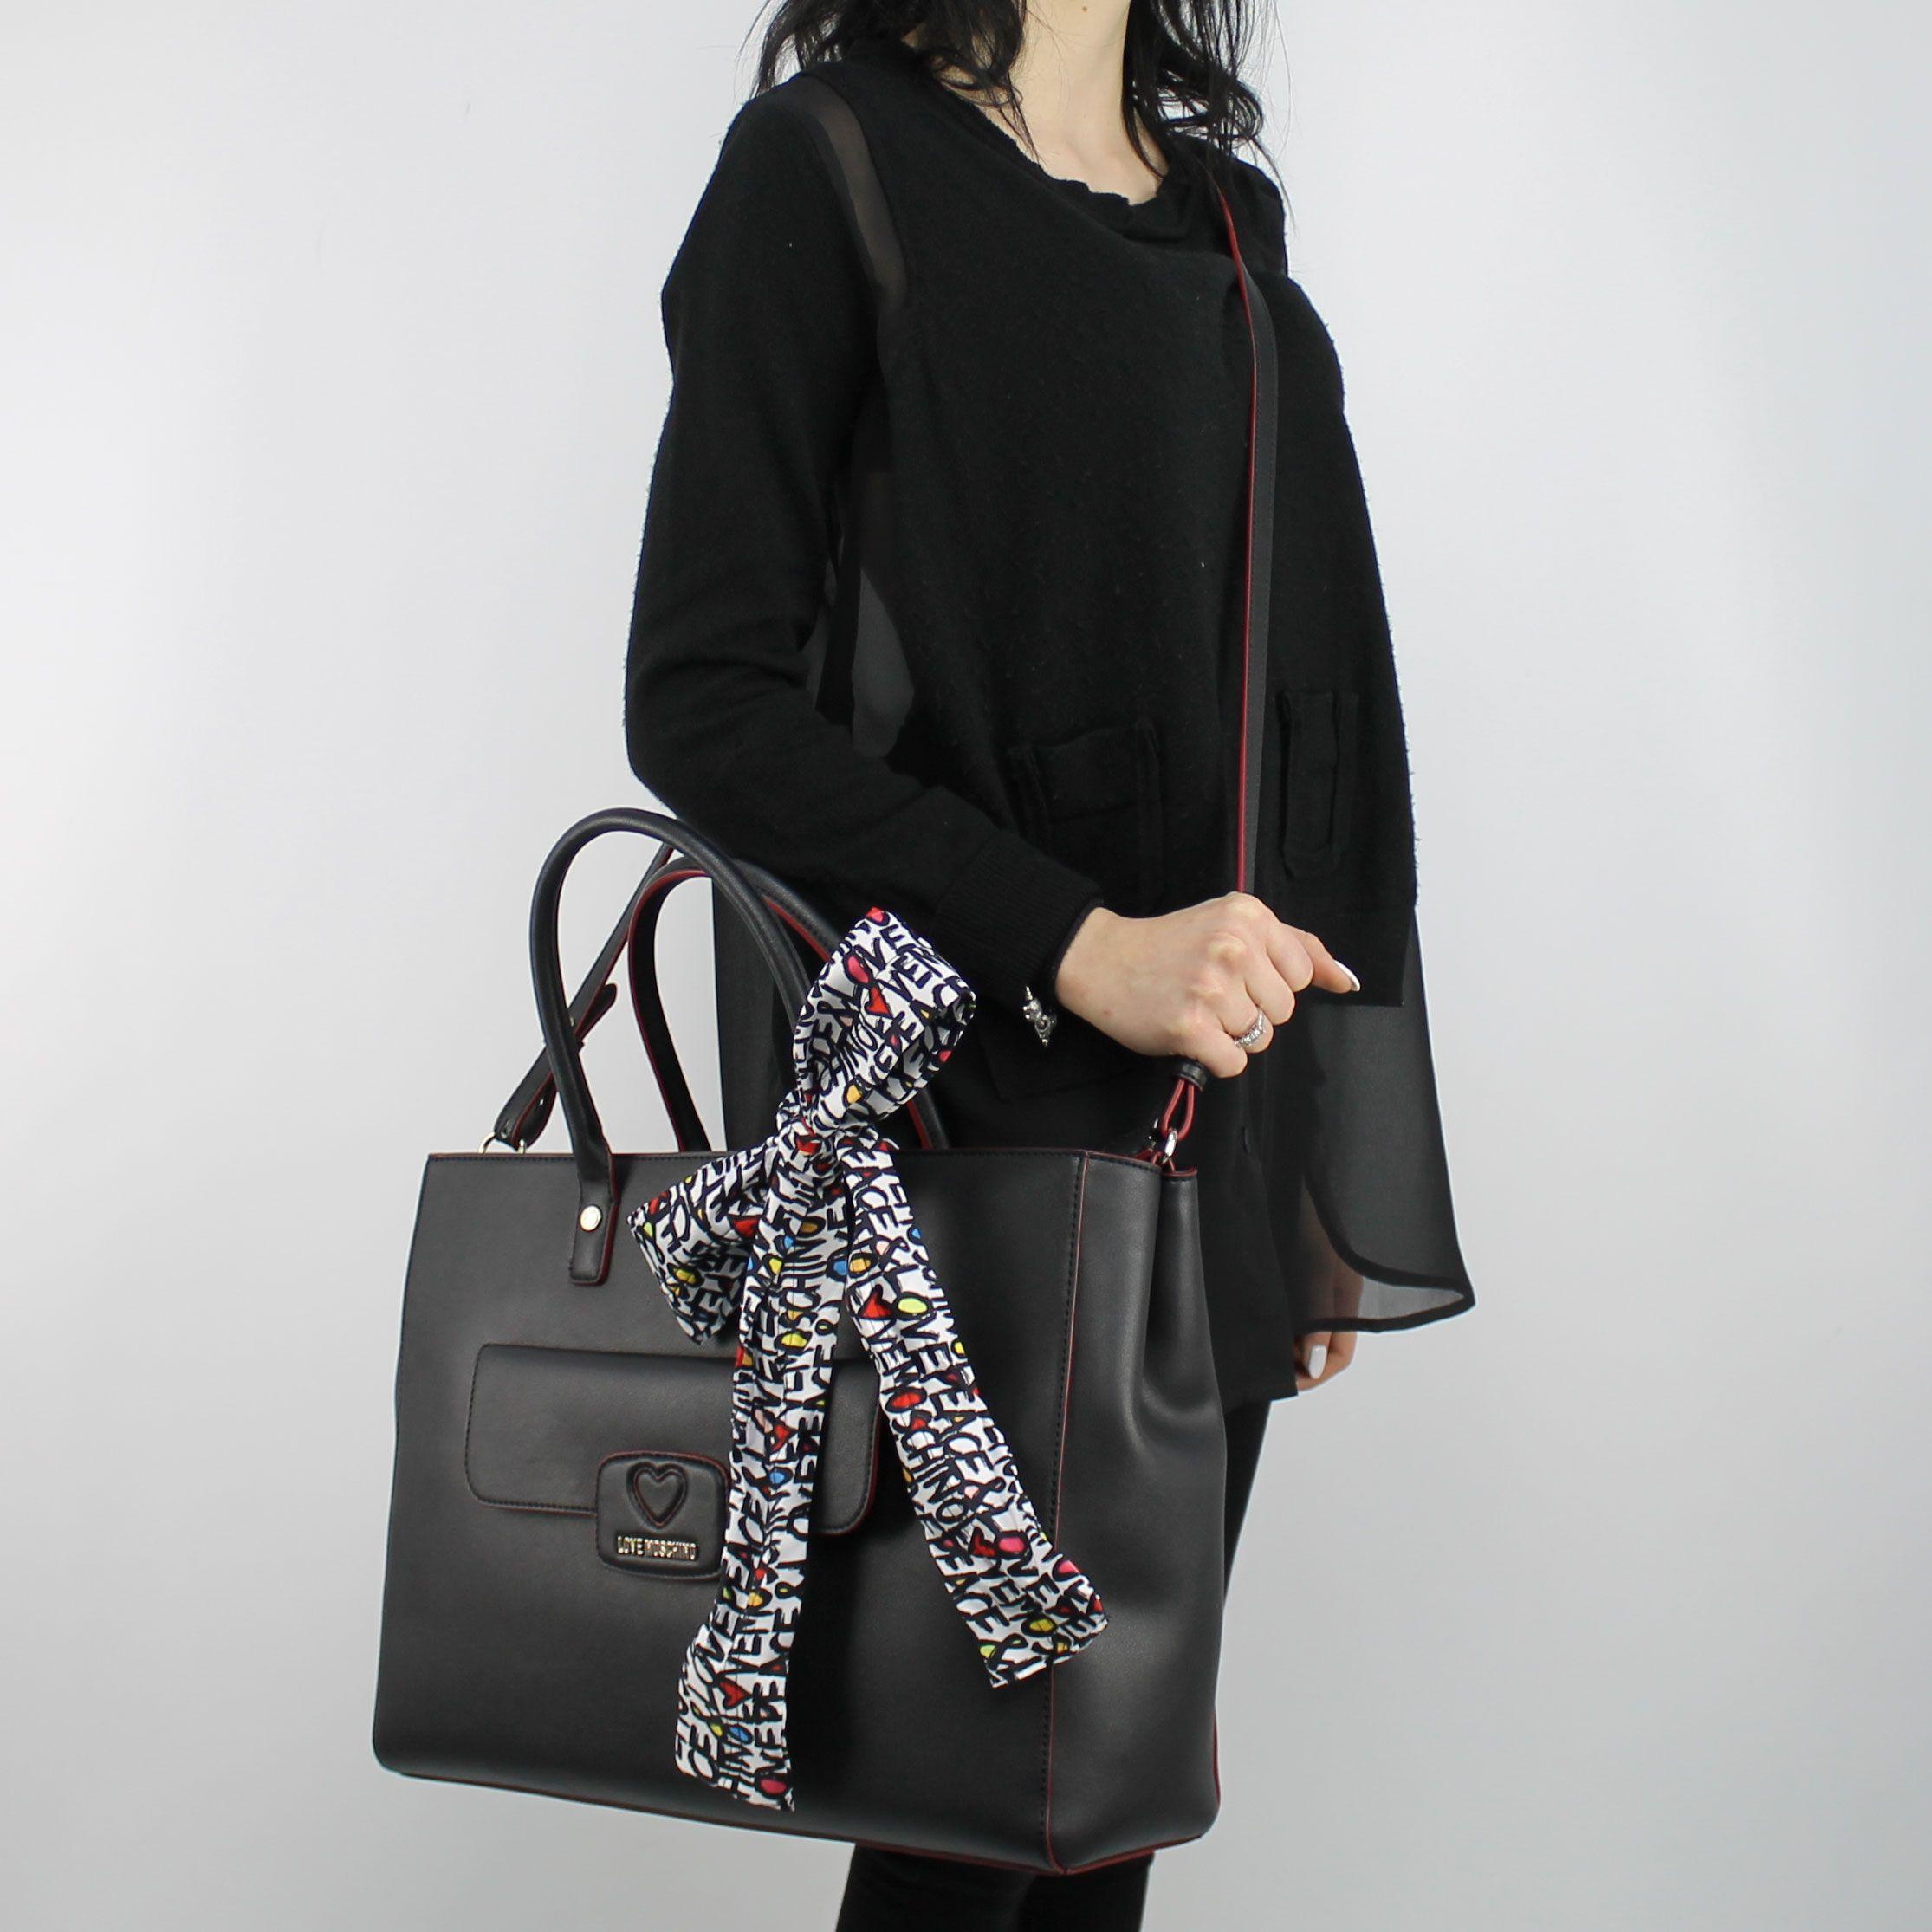 Shopping Store Borsa Nera More In Love Moschino Est Jc4255pp05kf0000 d4q84